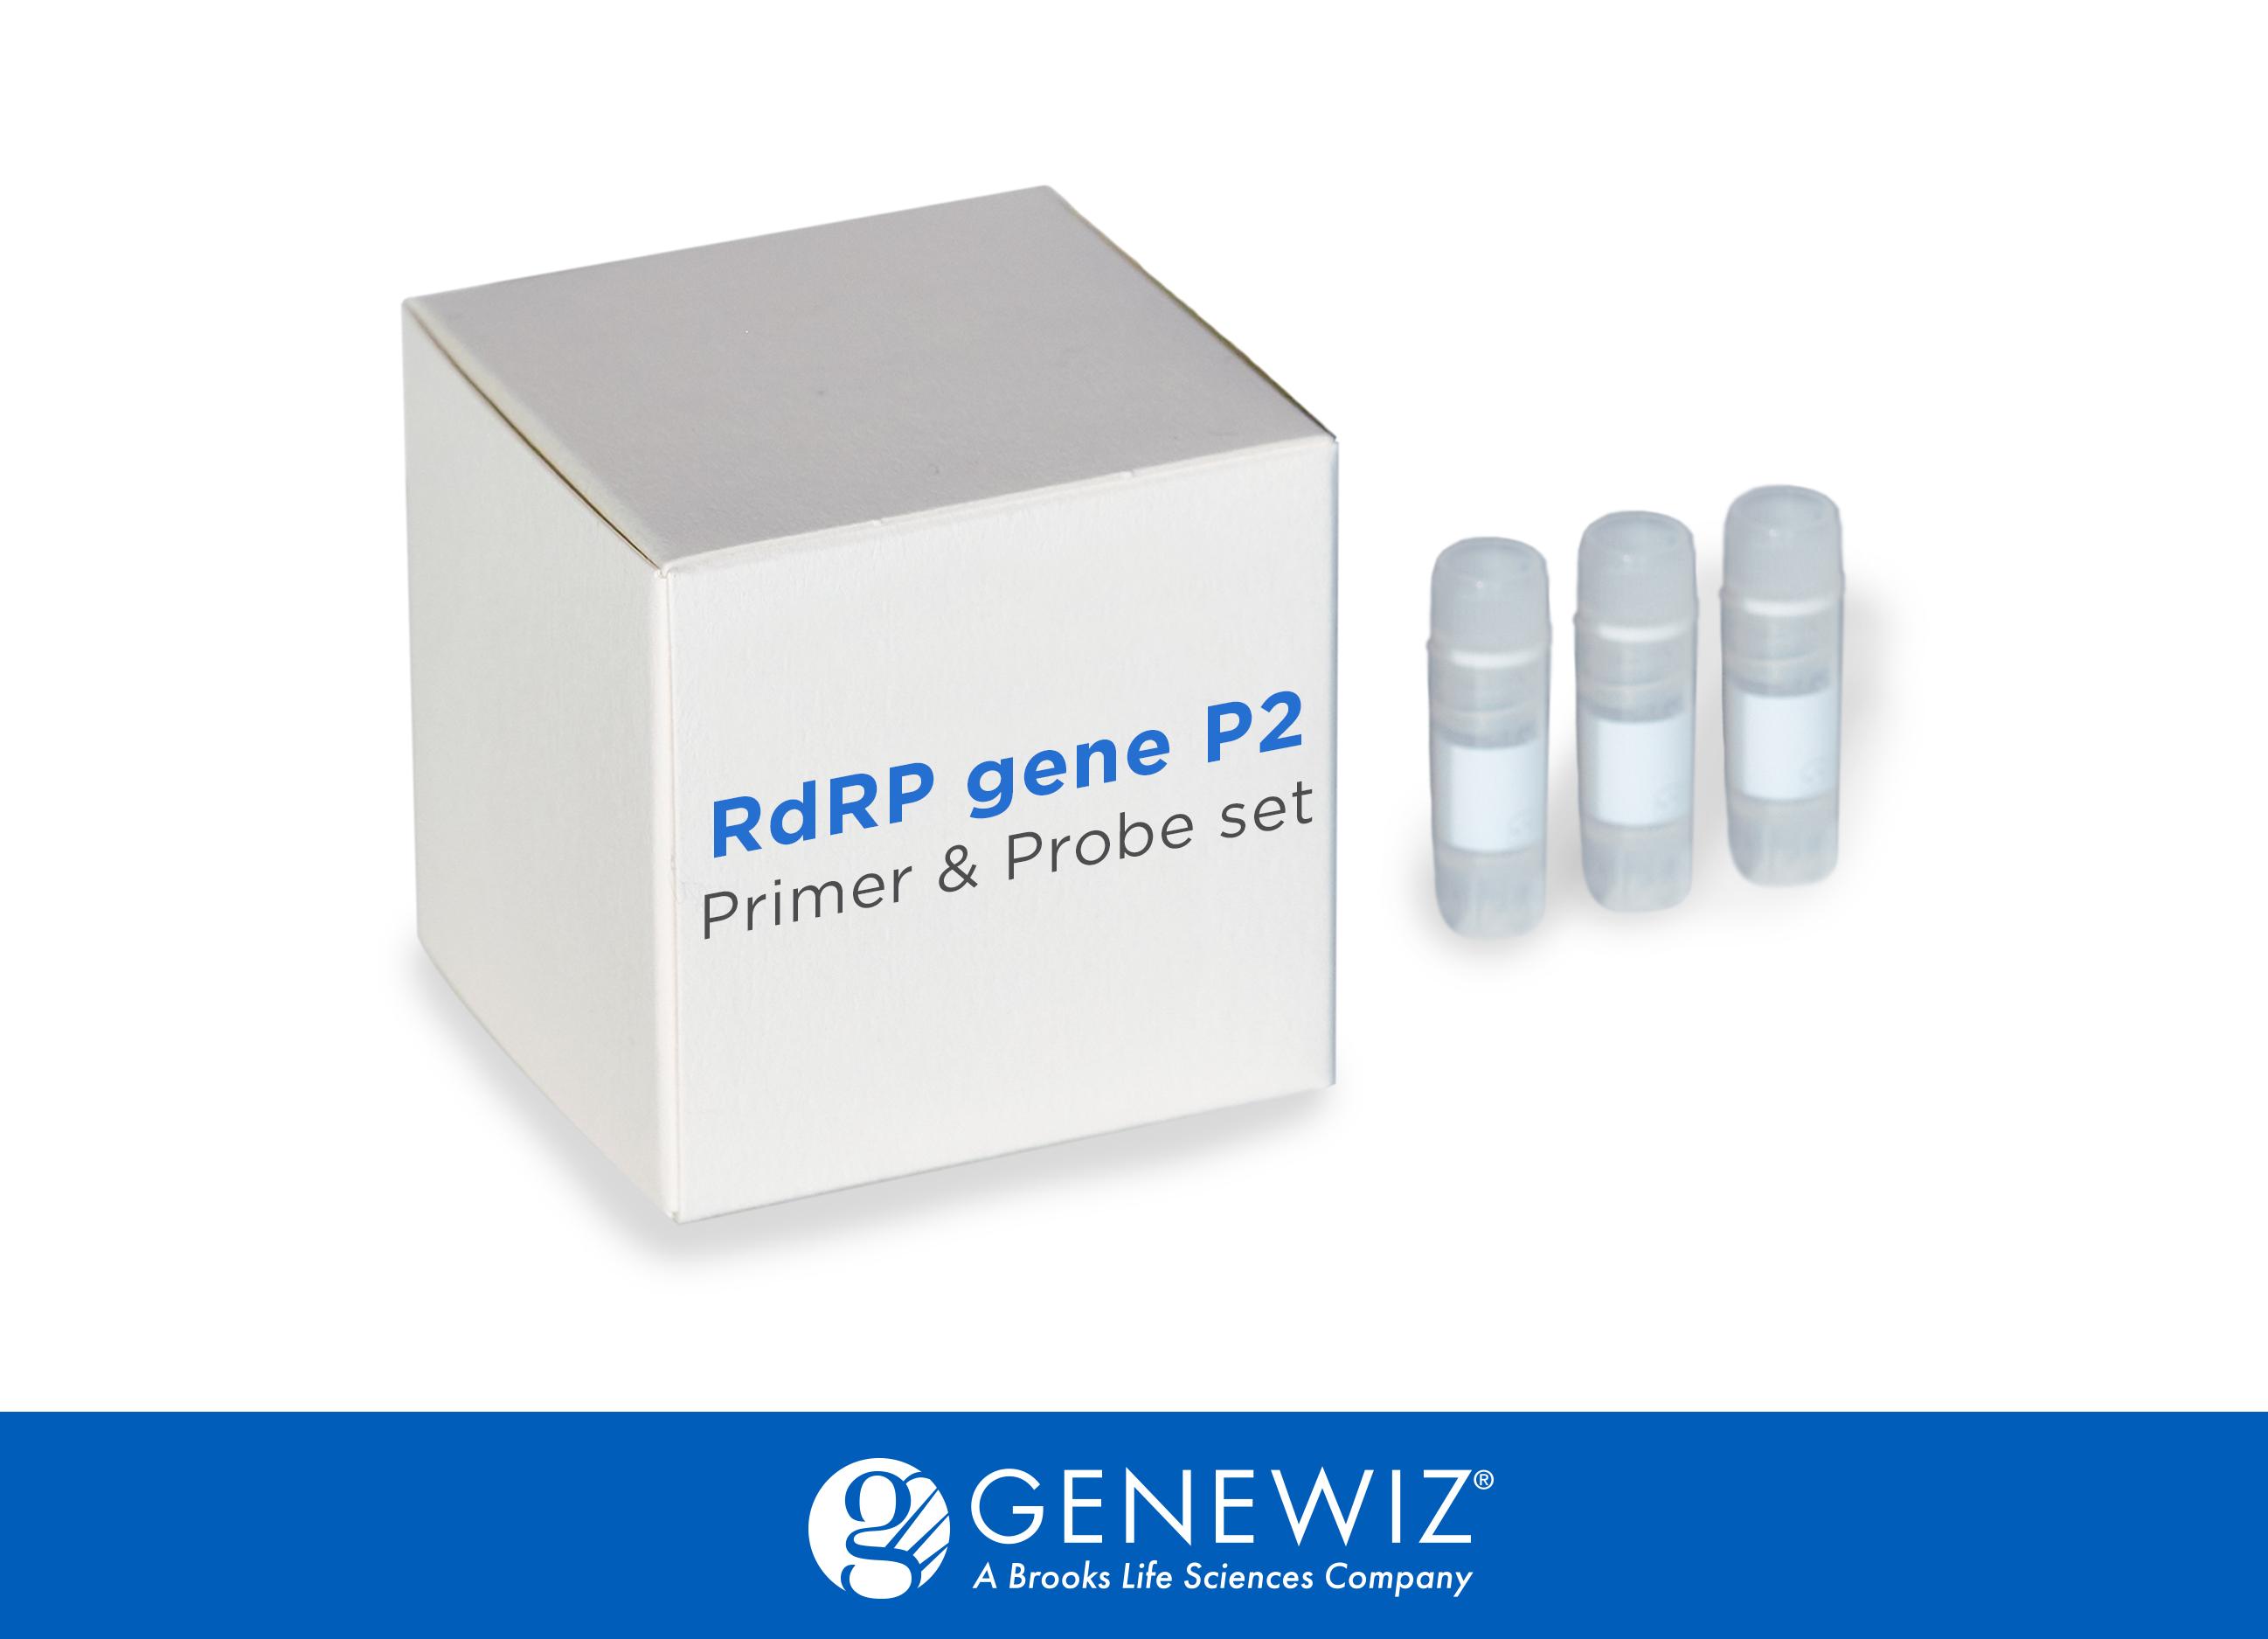 RdRP gene P2 Primer & Probe set